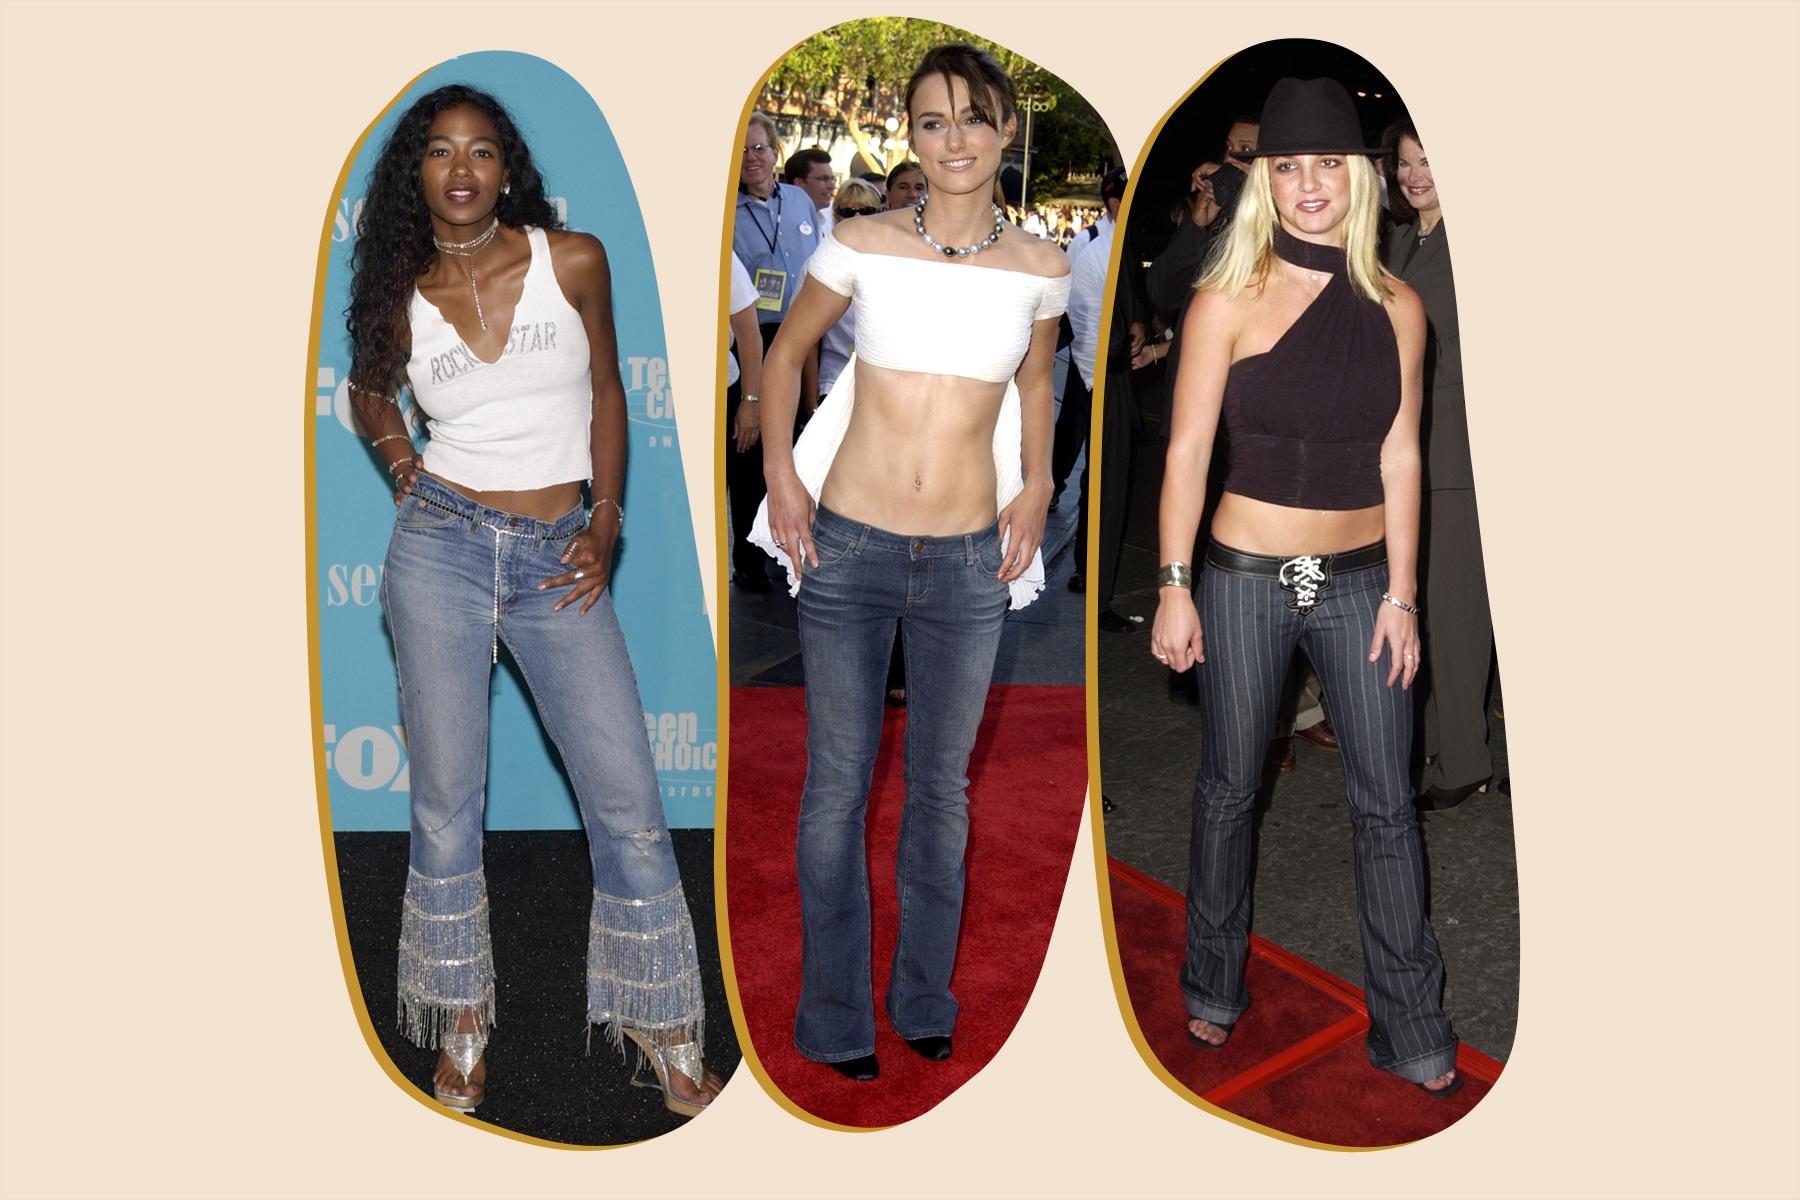 Ananda Lewis, Keira Knightley, Britney Spears